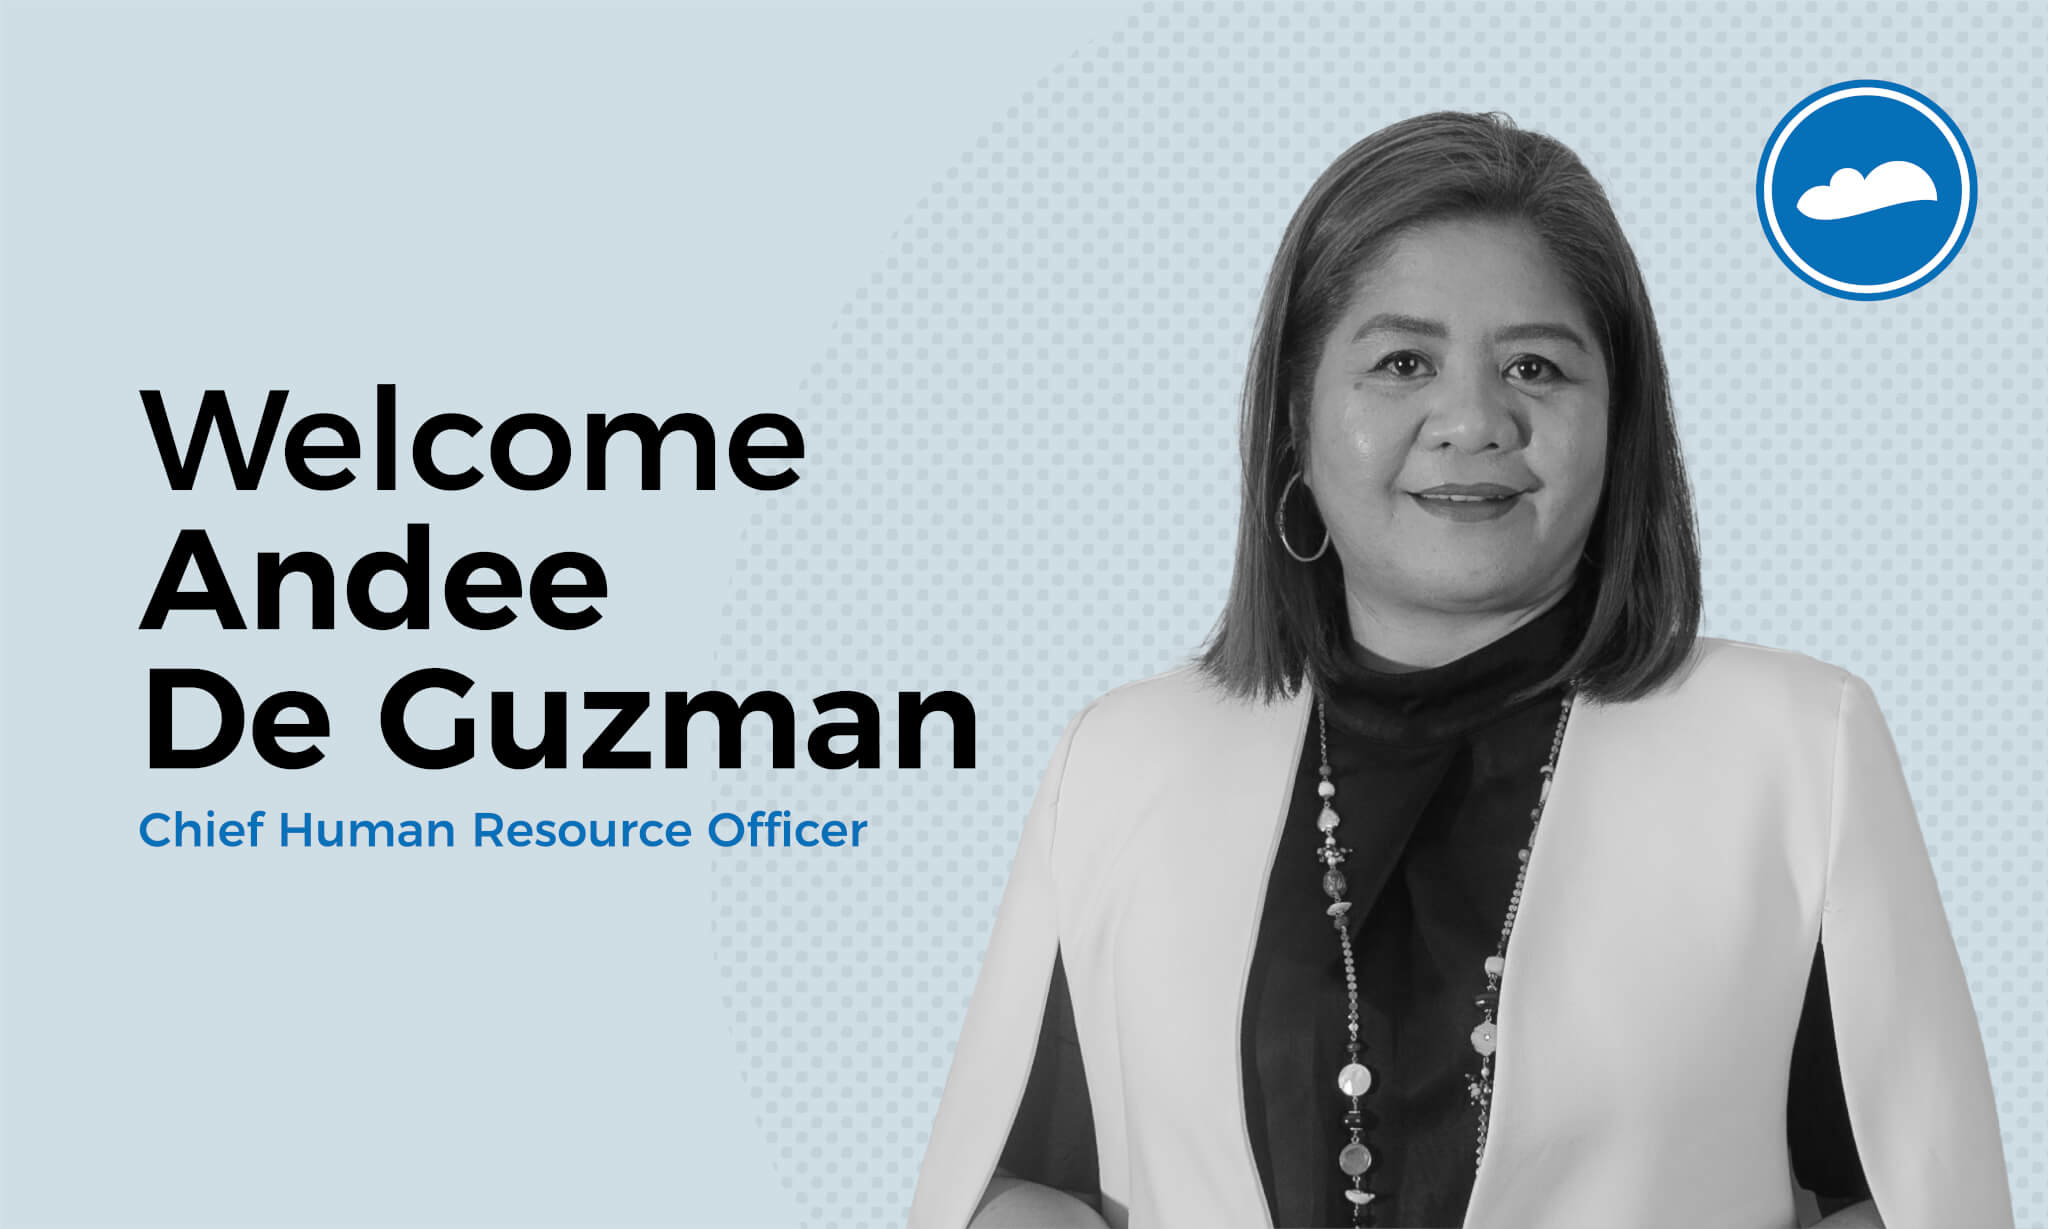 Cloudstaff announces Andrea De Guzman as Chief Human Resource Officer